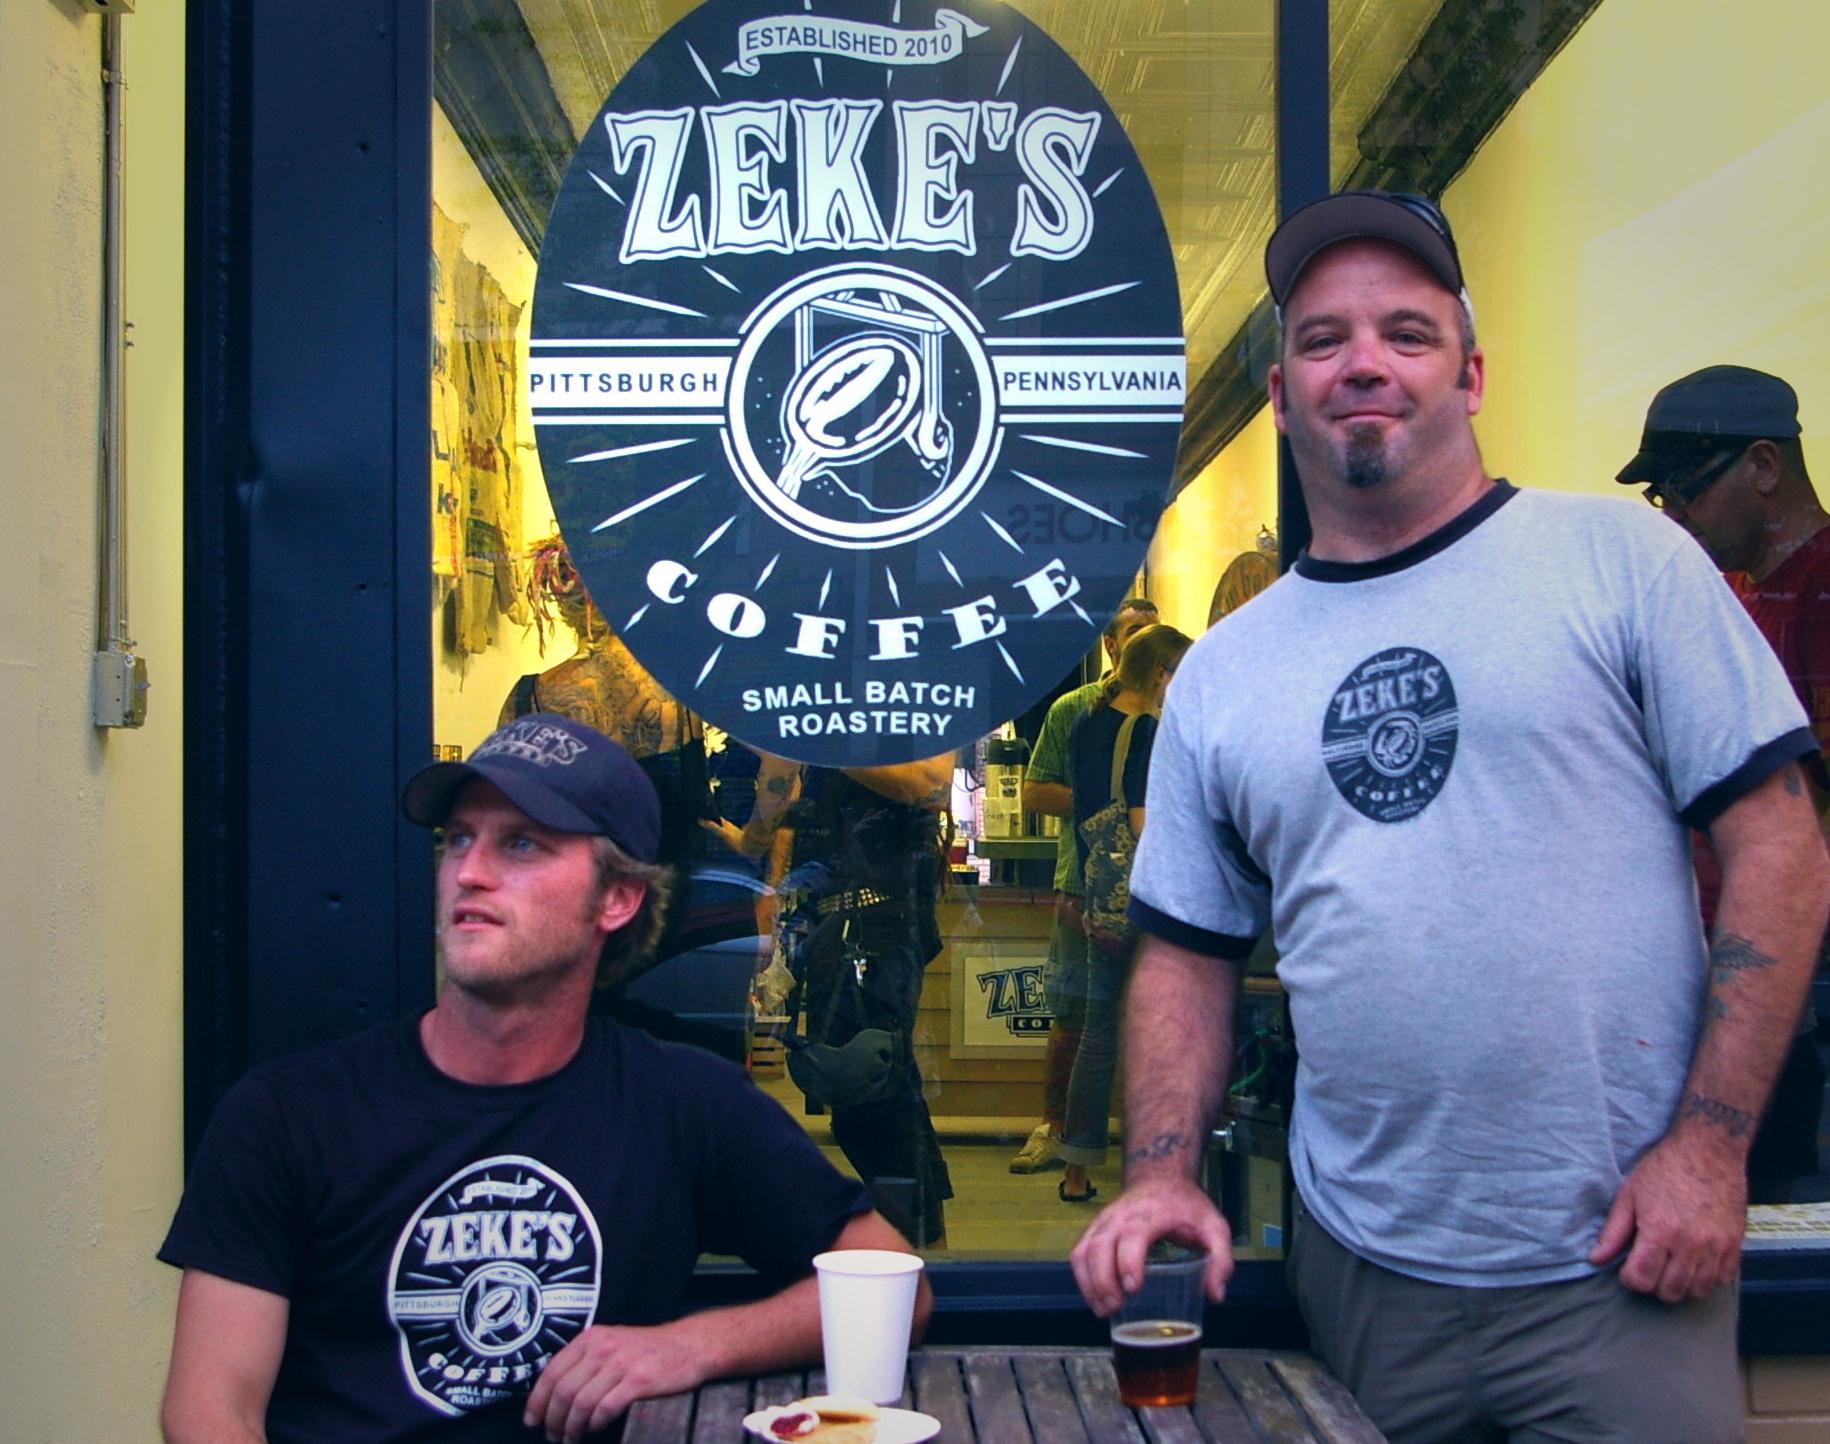 Zeke's Coffee